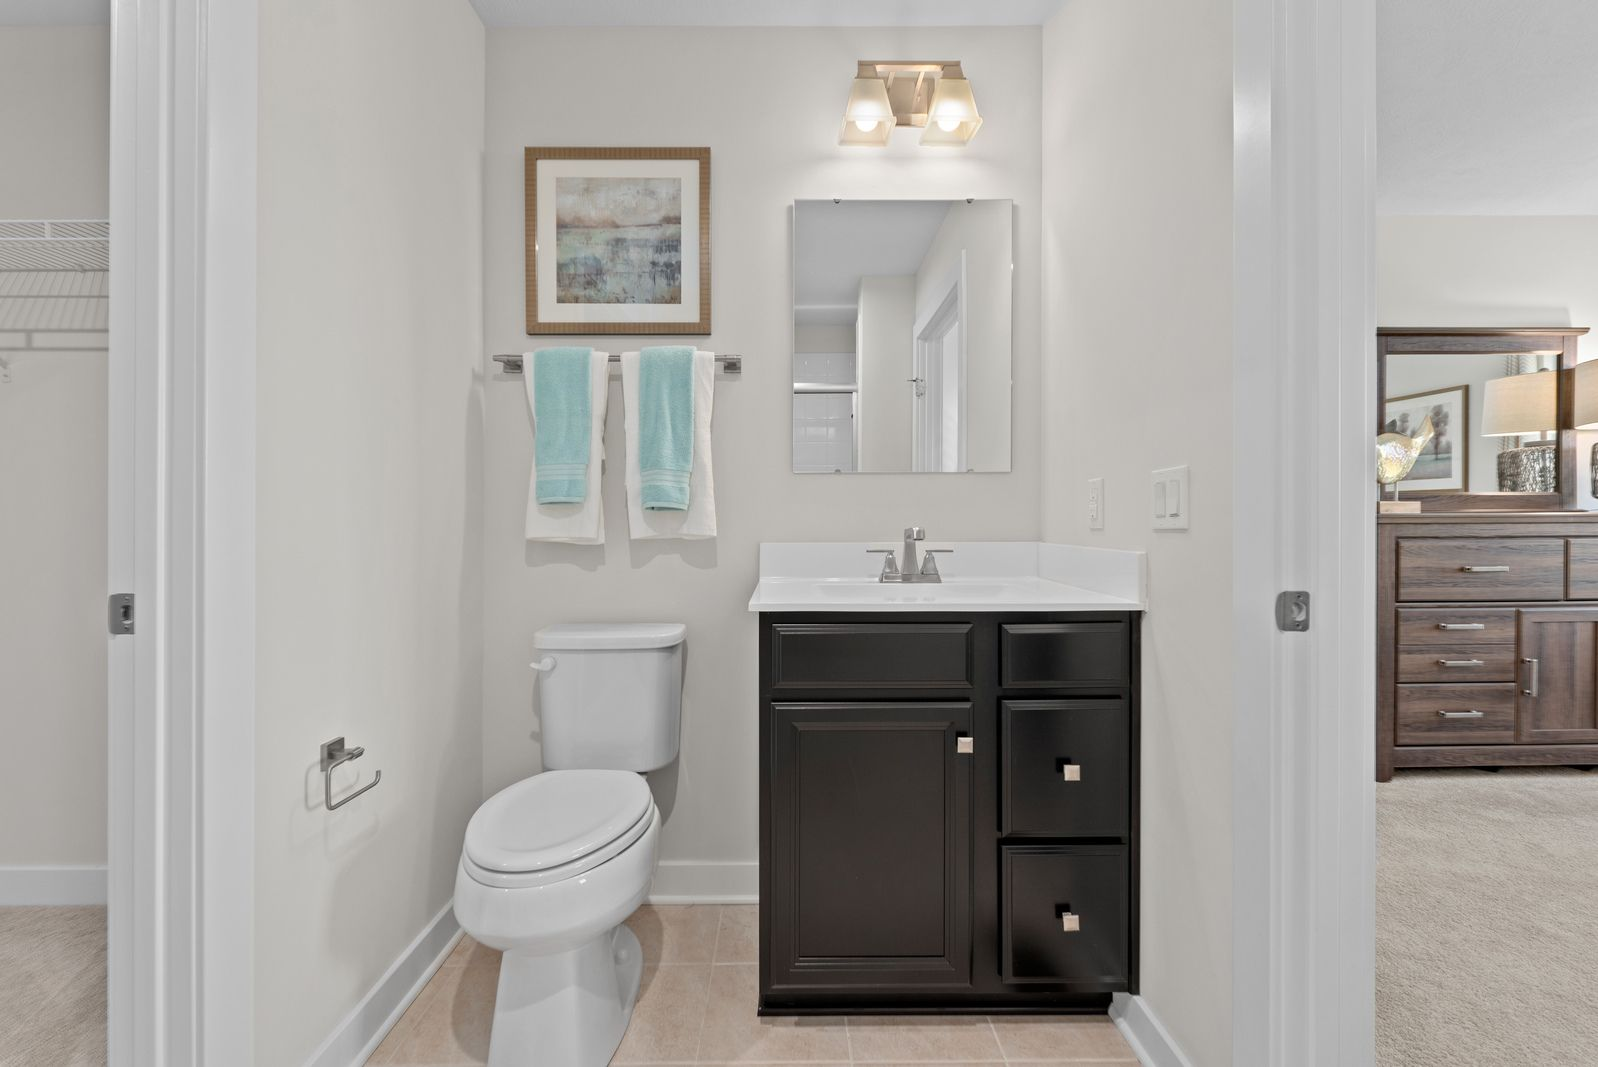 Bathroom featured in the Barbados Isle By Ryan Homes in Harrisonburg, VA